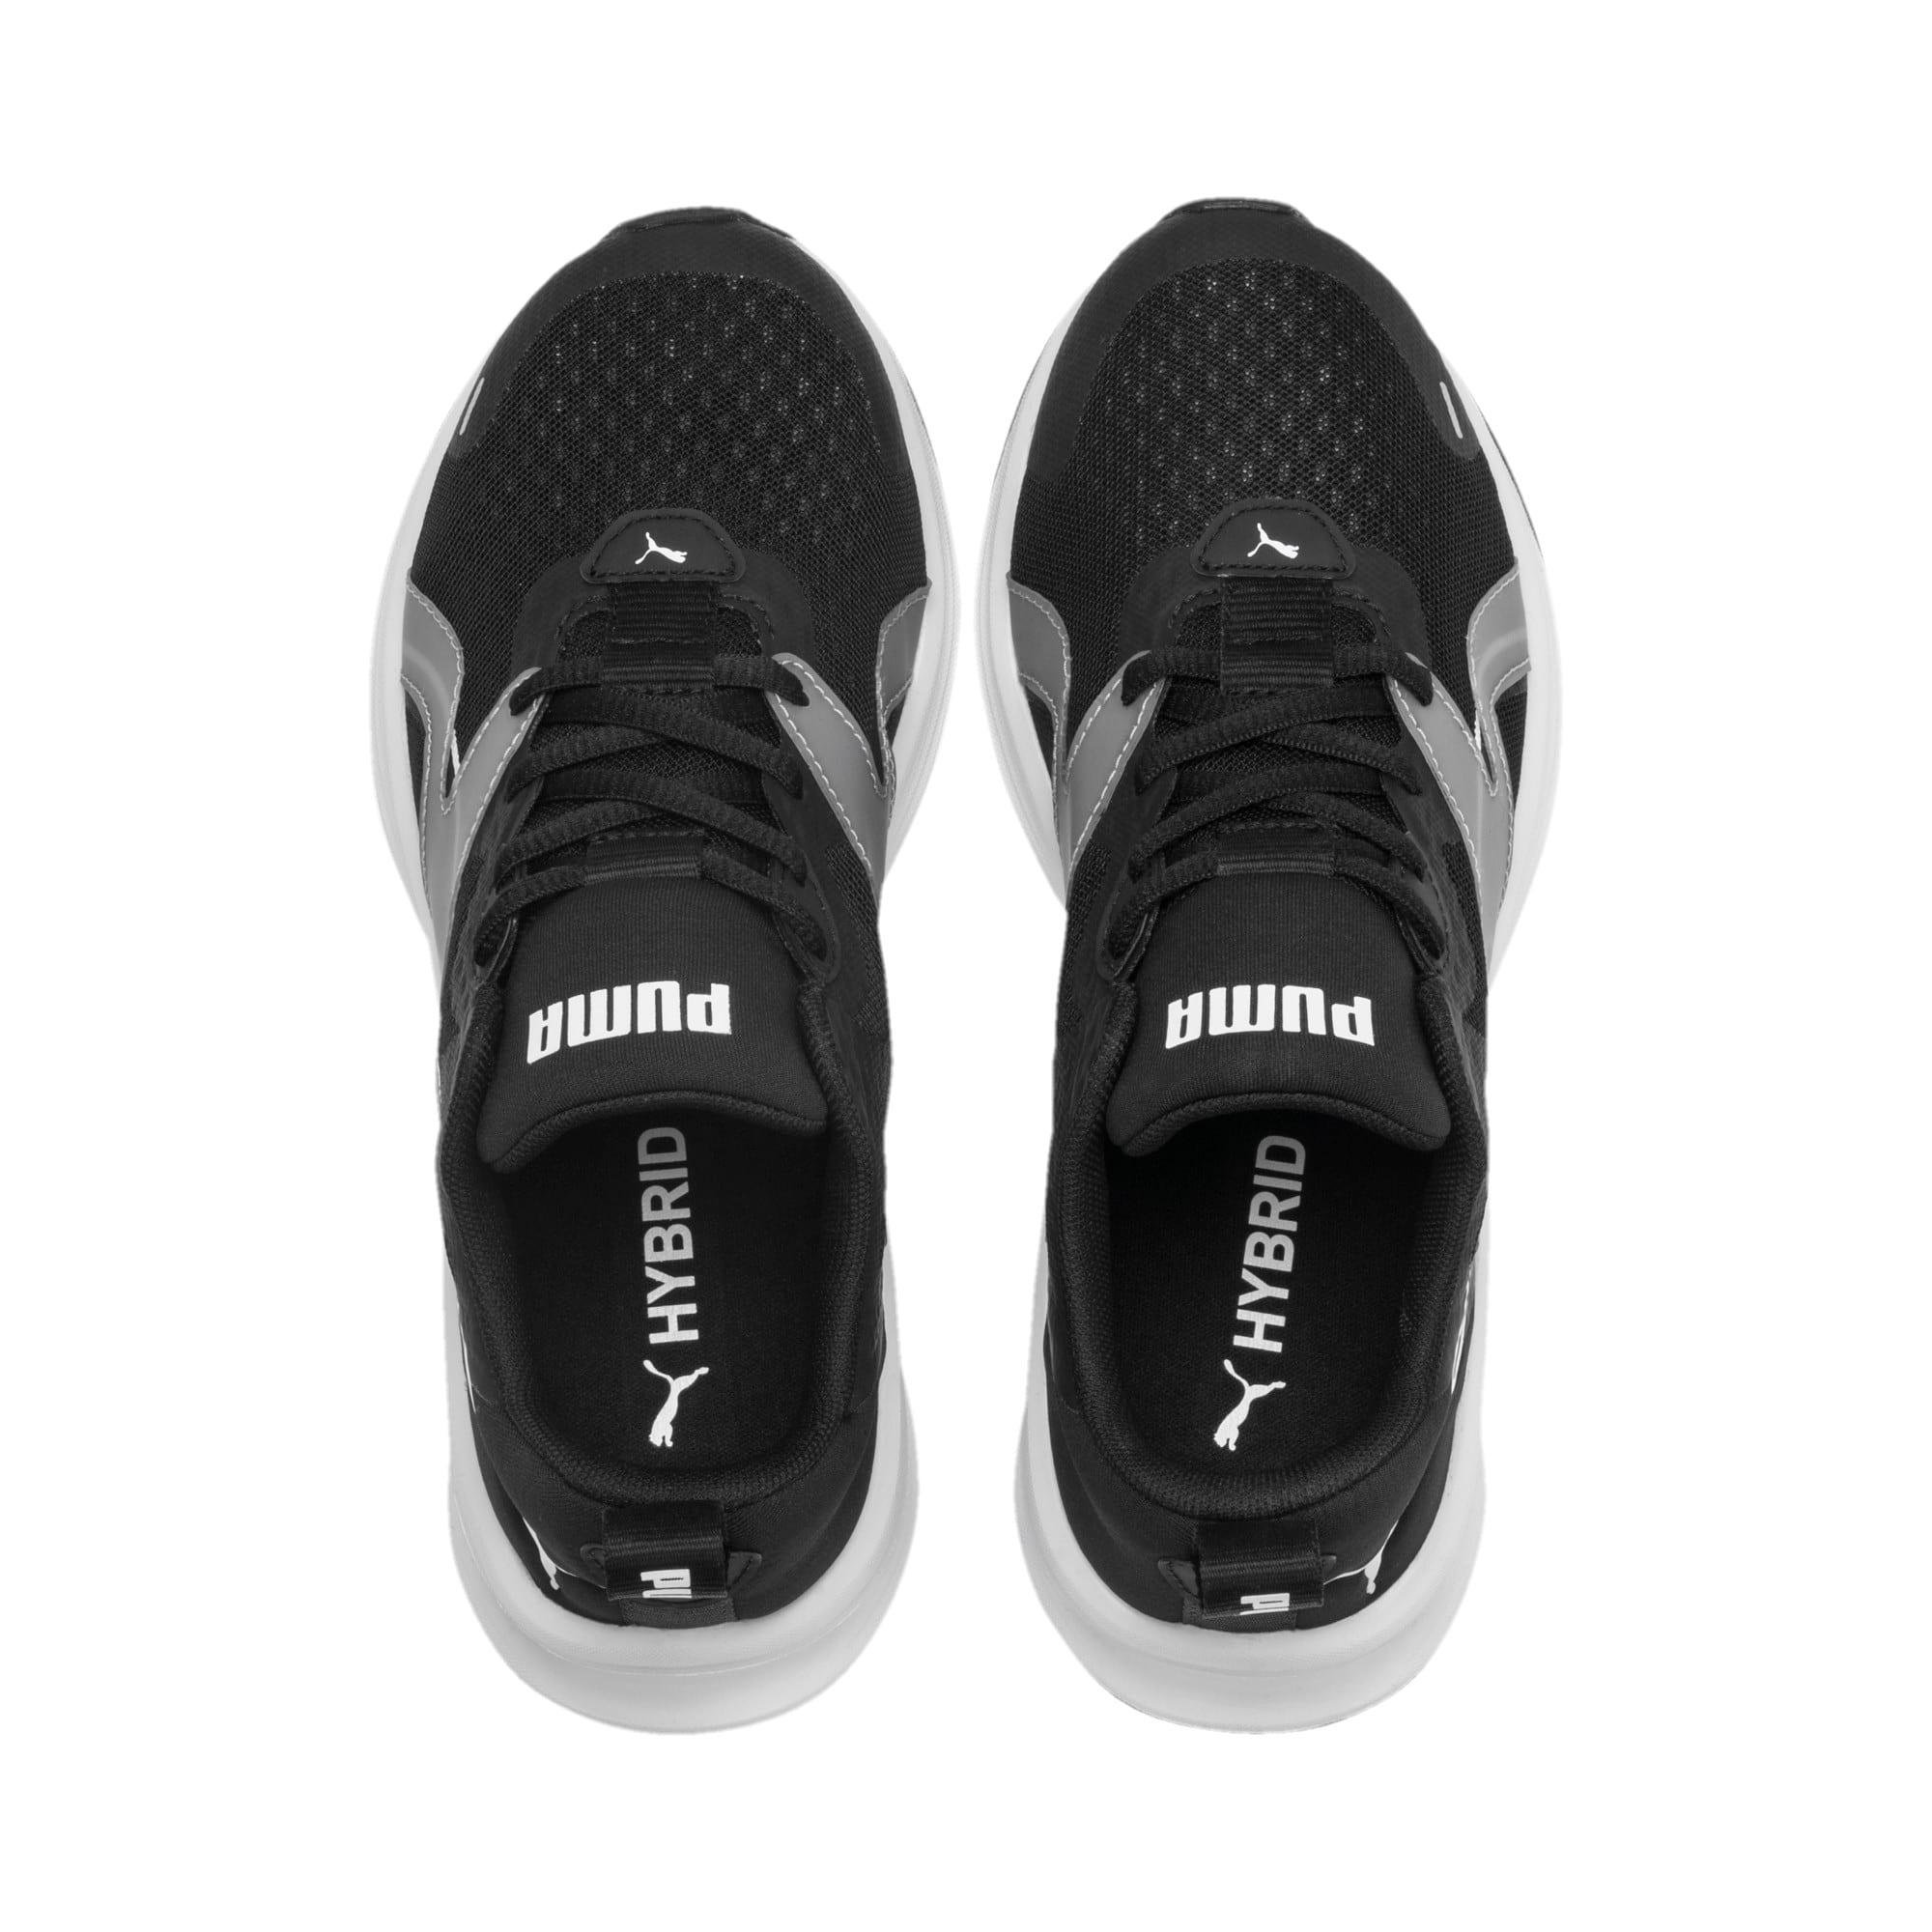 Thumbnail 6 of HYBRID Fuego Running Shoes JR, Puma Black-Puma White, medium